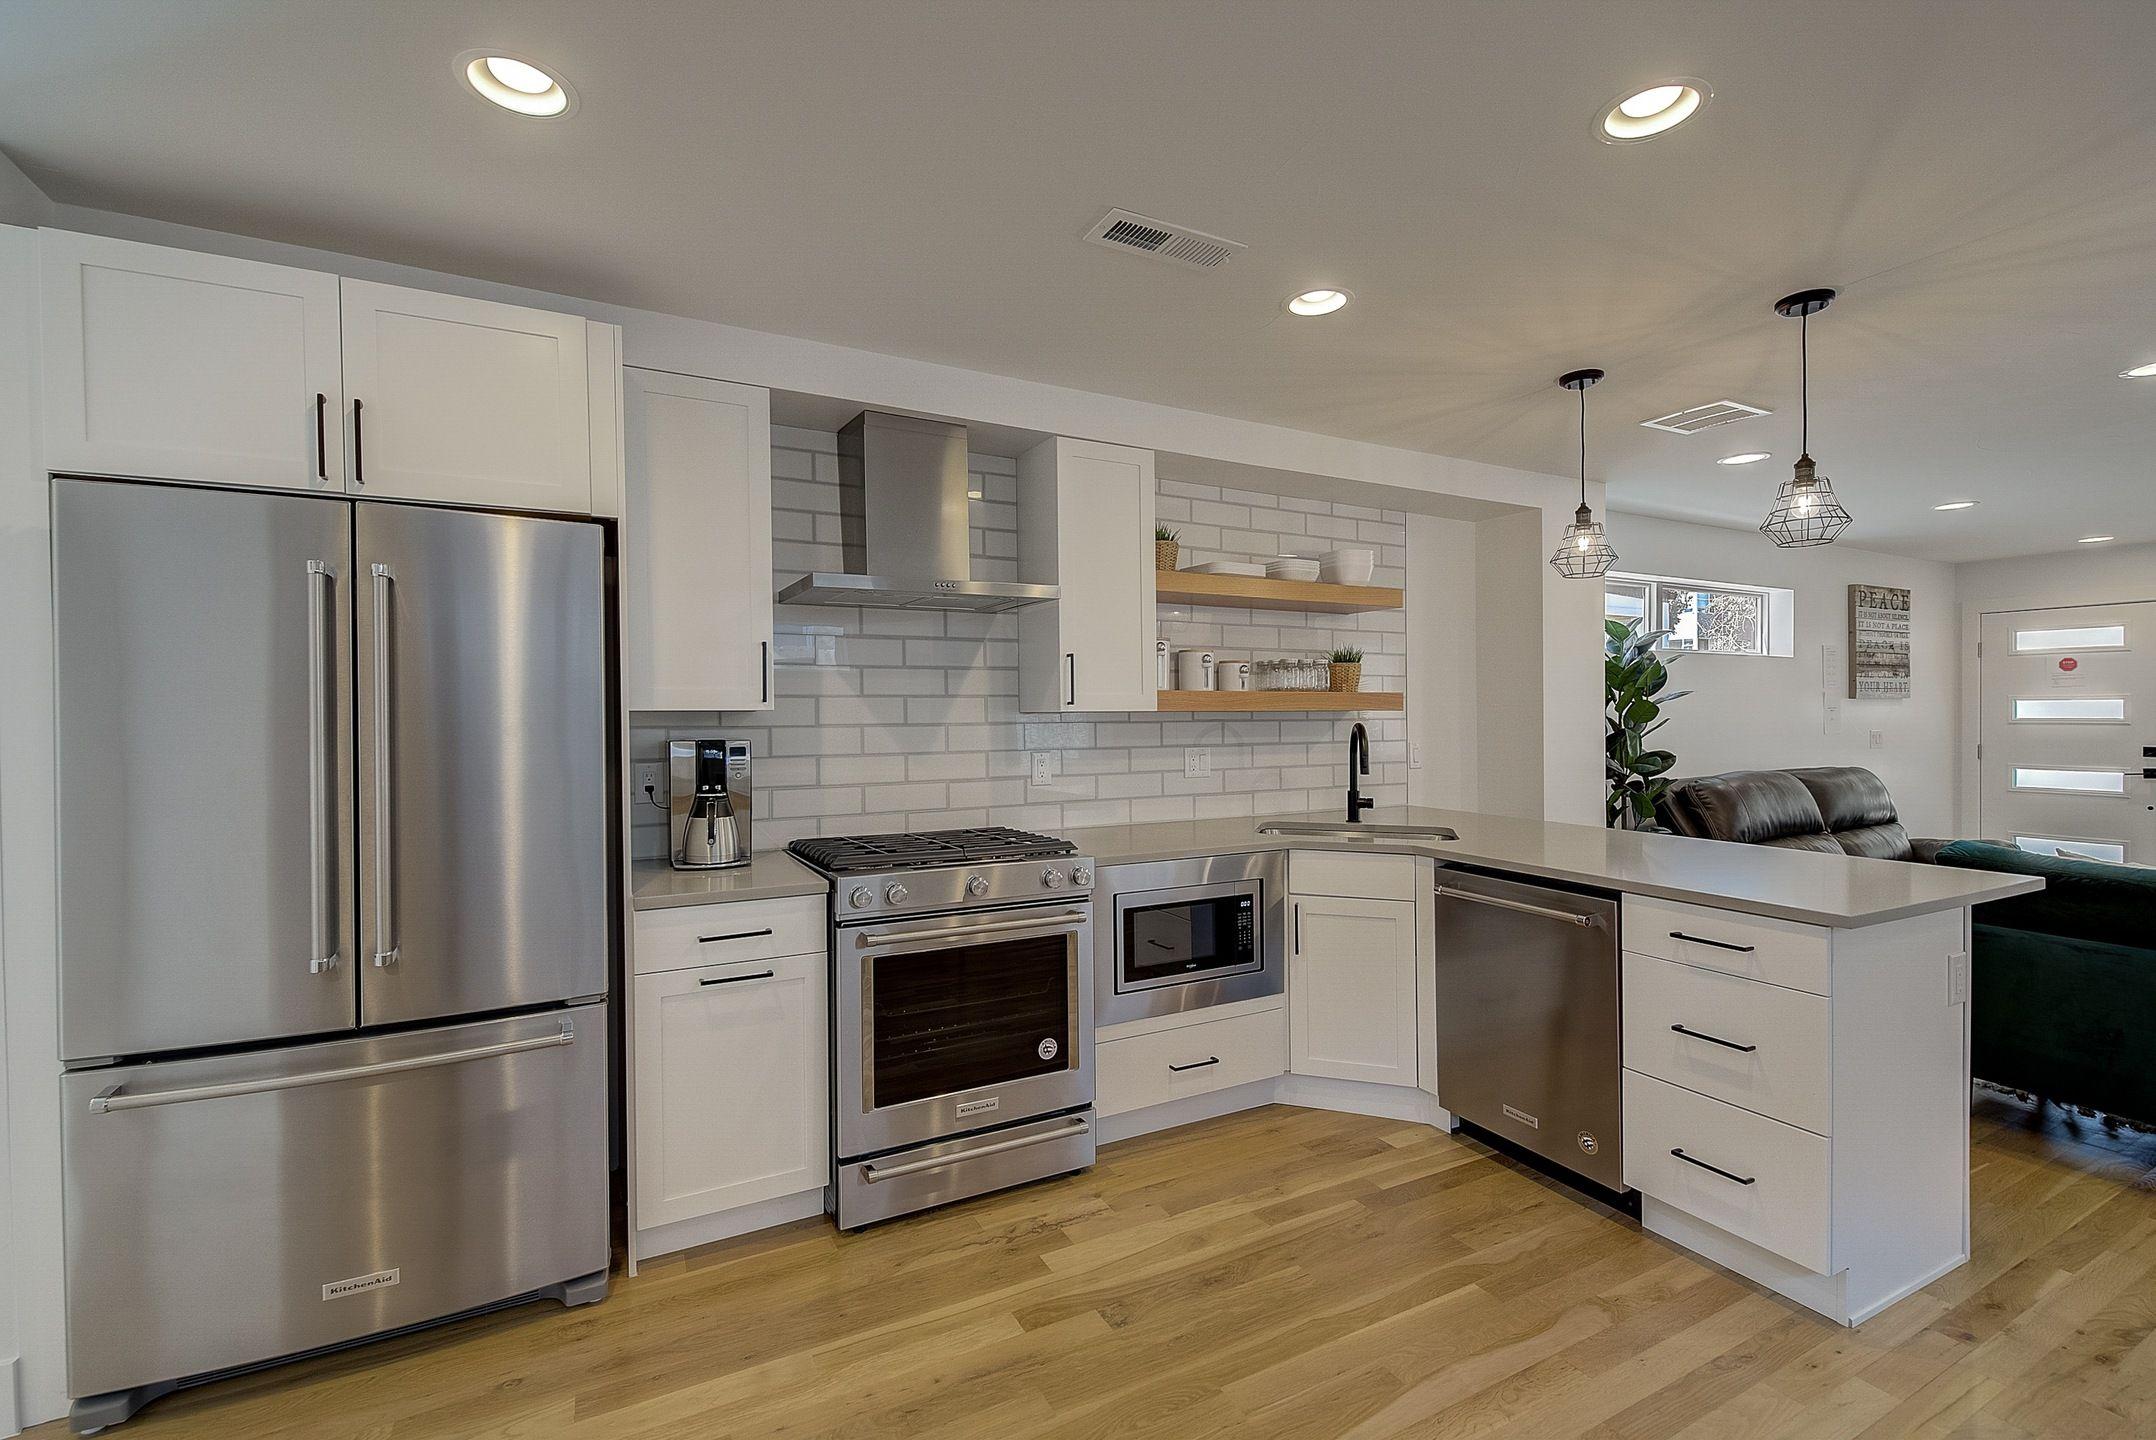 2132 S. Josephine St. kitchen